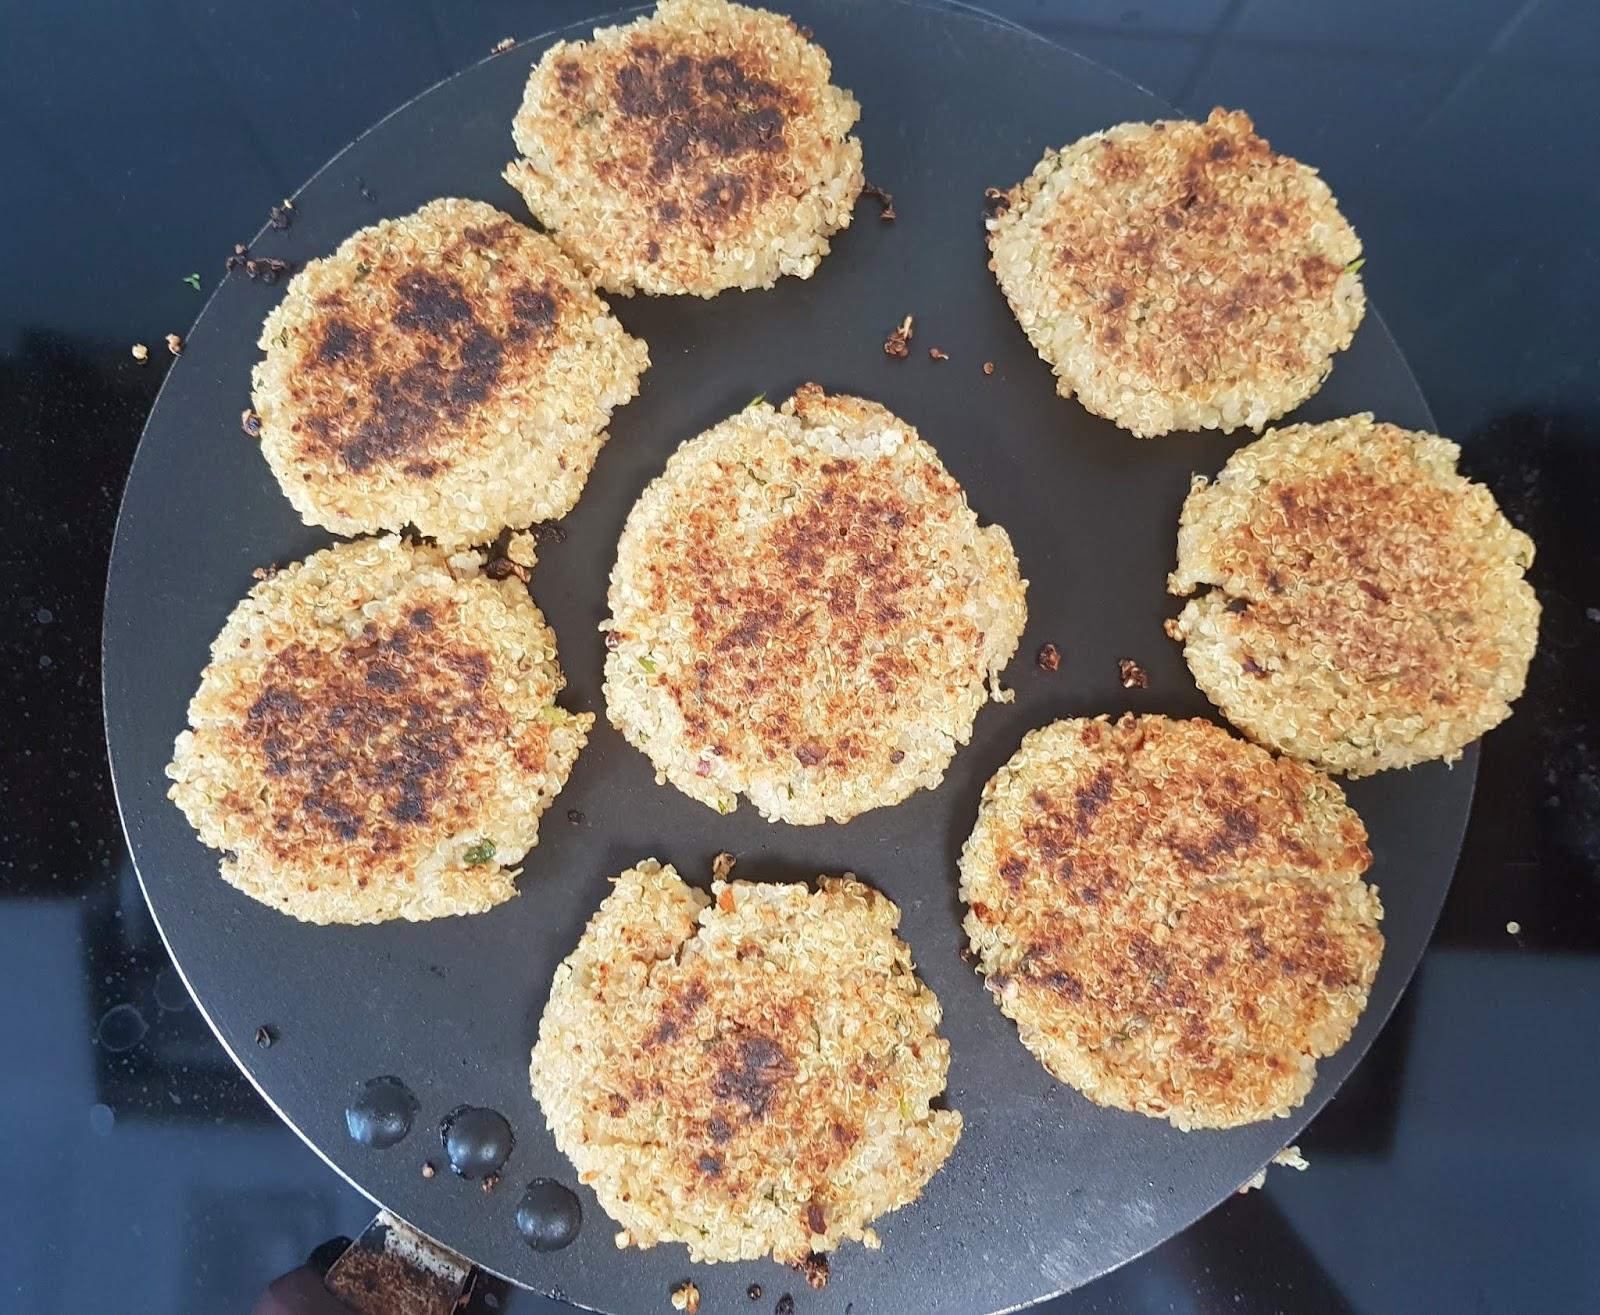 Vegan quinoa cutlet recipe - high protein vegan recipes - Healthy lunch ideas